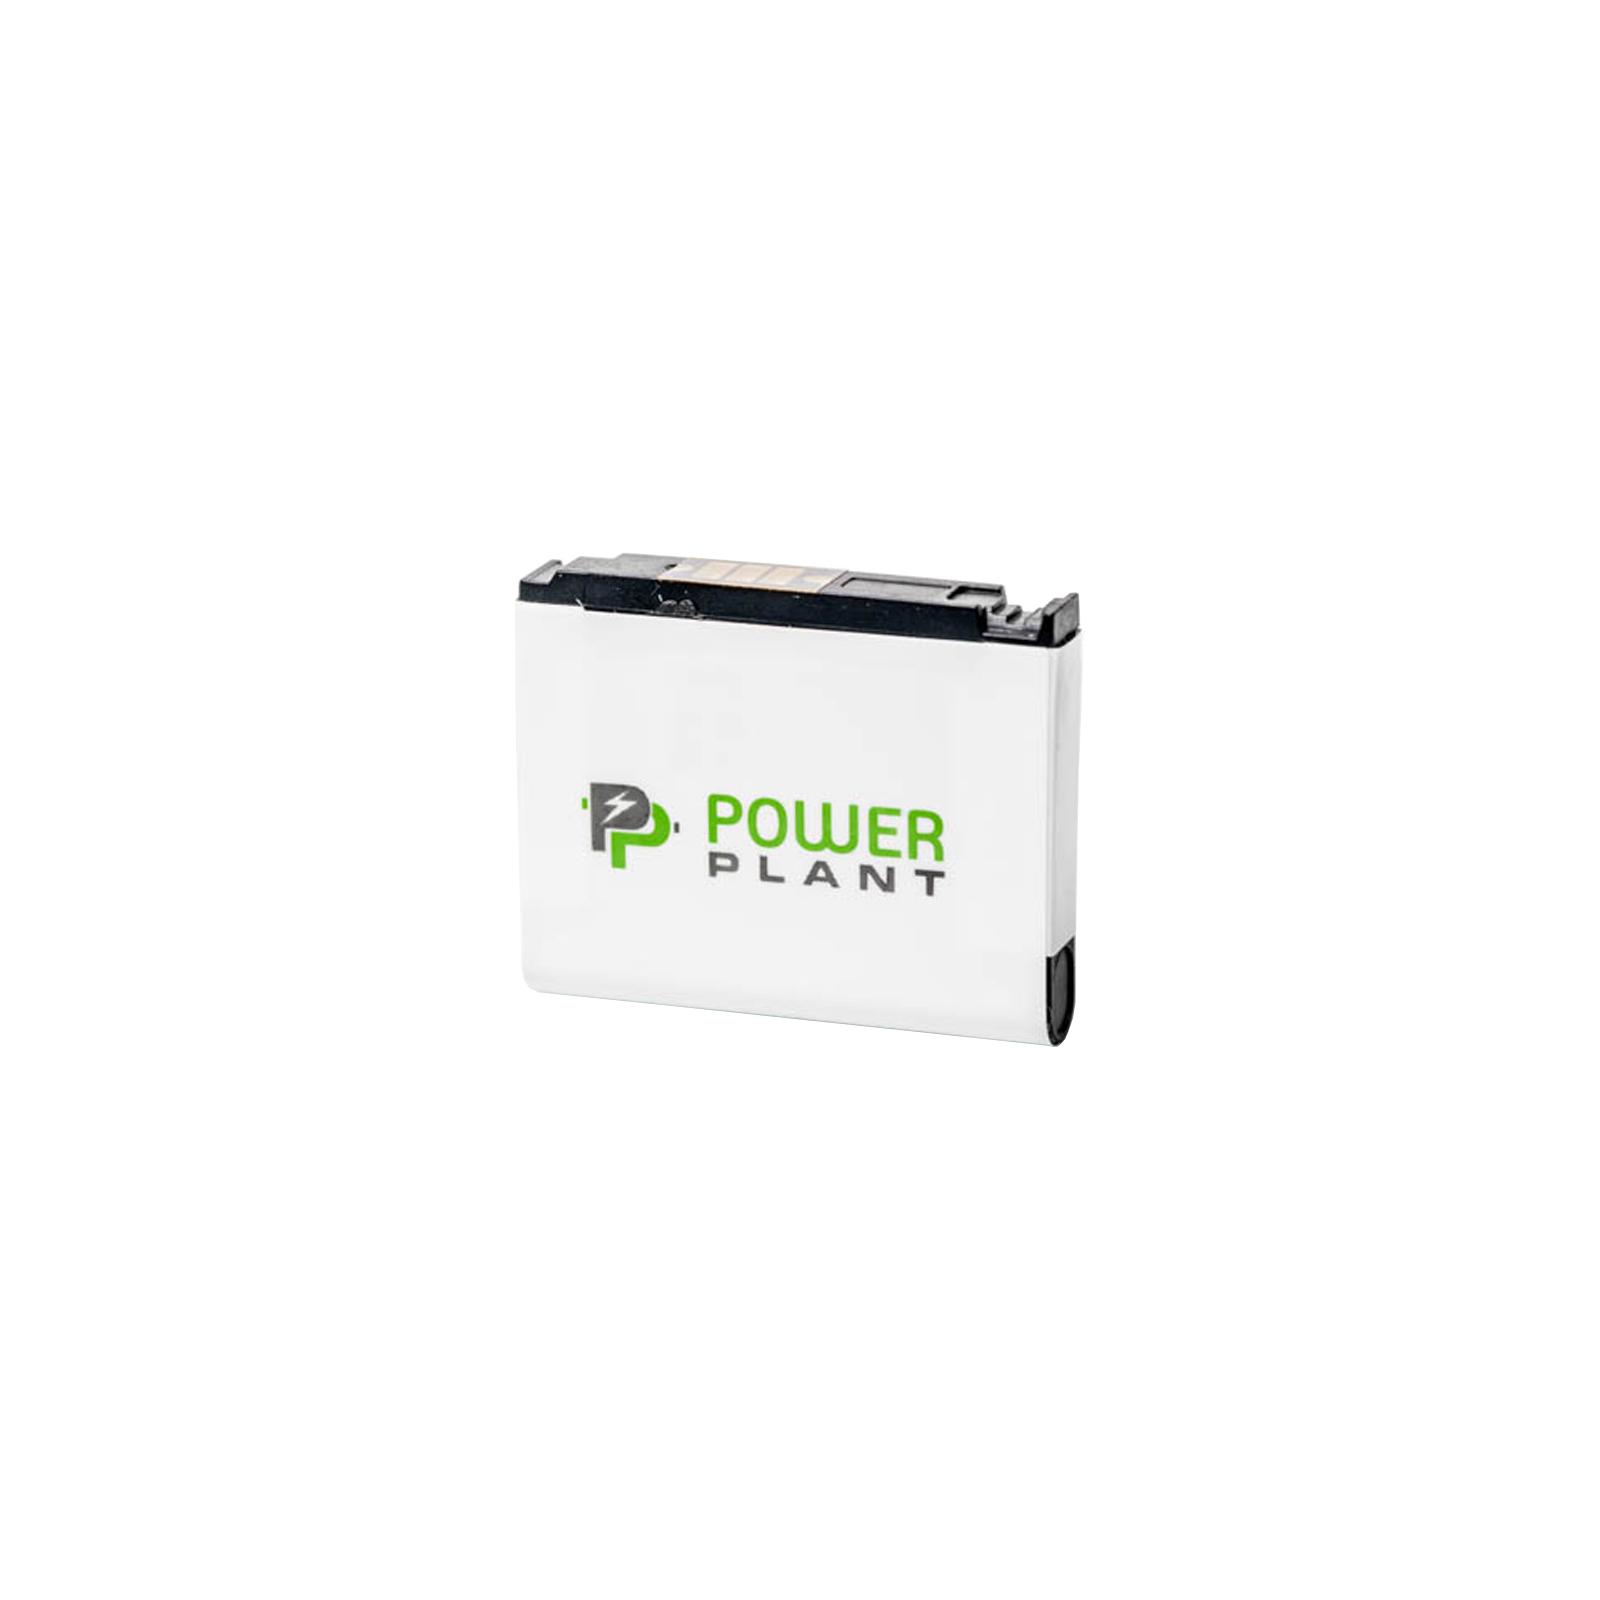 Аккумуляторная батарея PowerPlant Samsung U908 (E950/Z240/U900/F309/J758) (DV00DV6169)